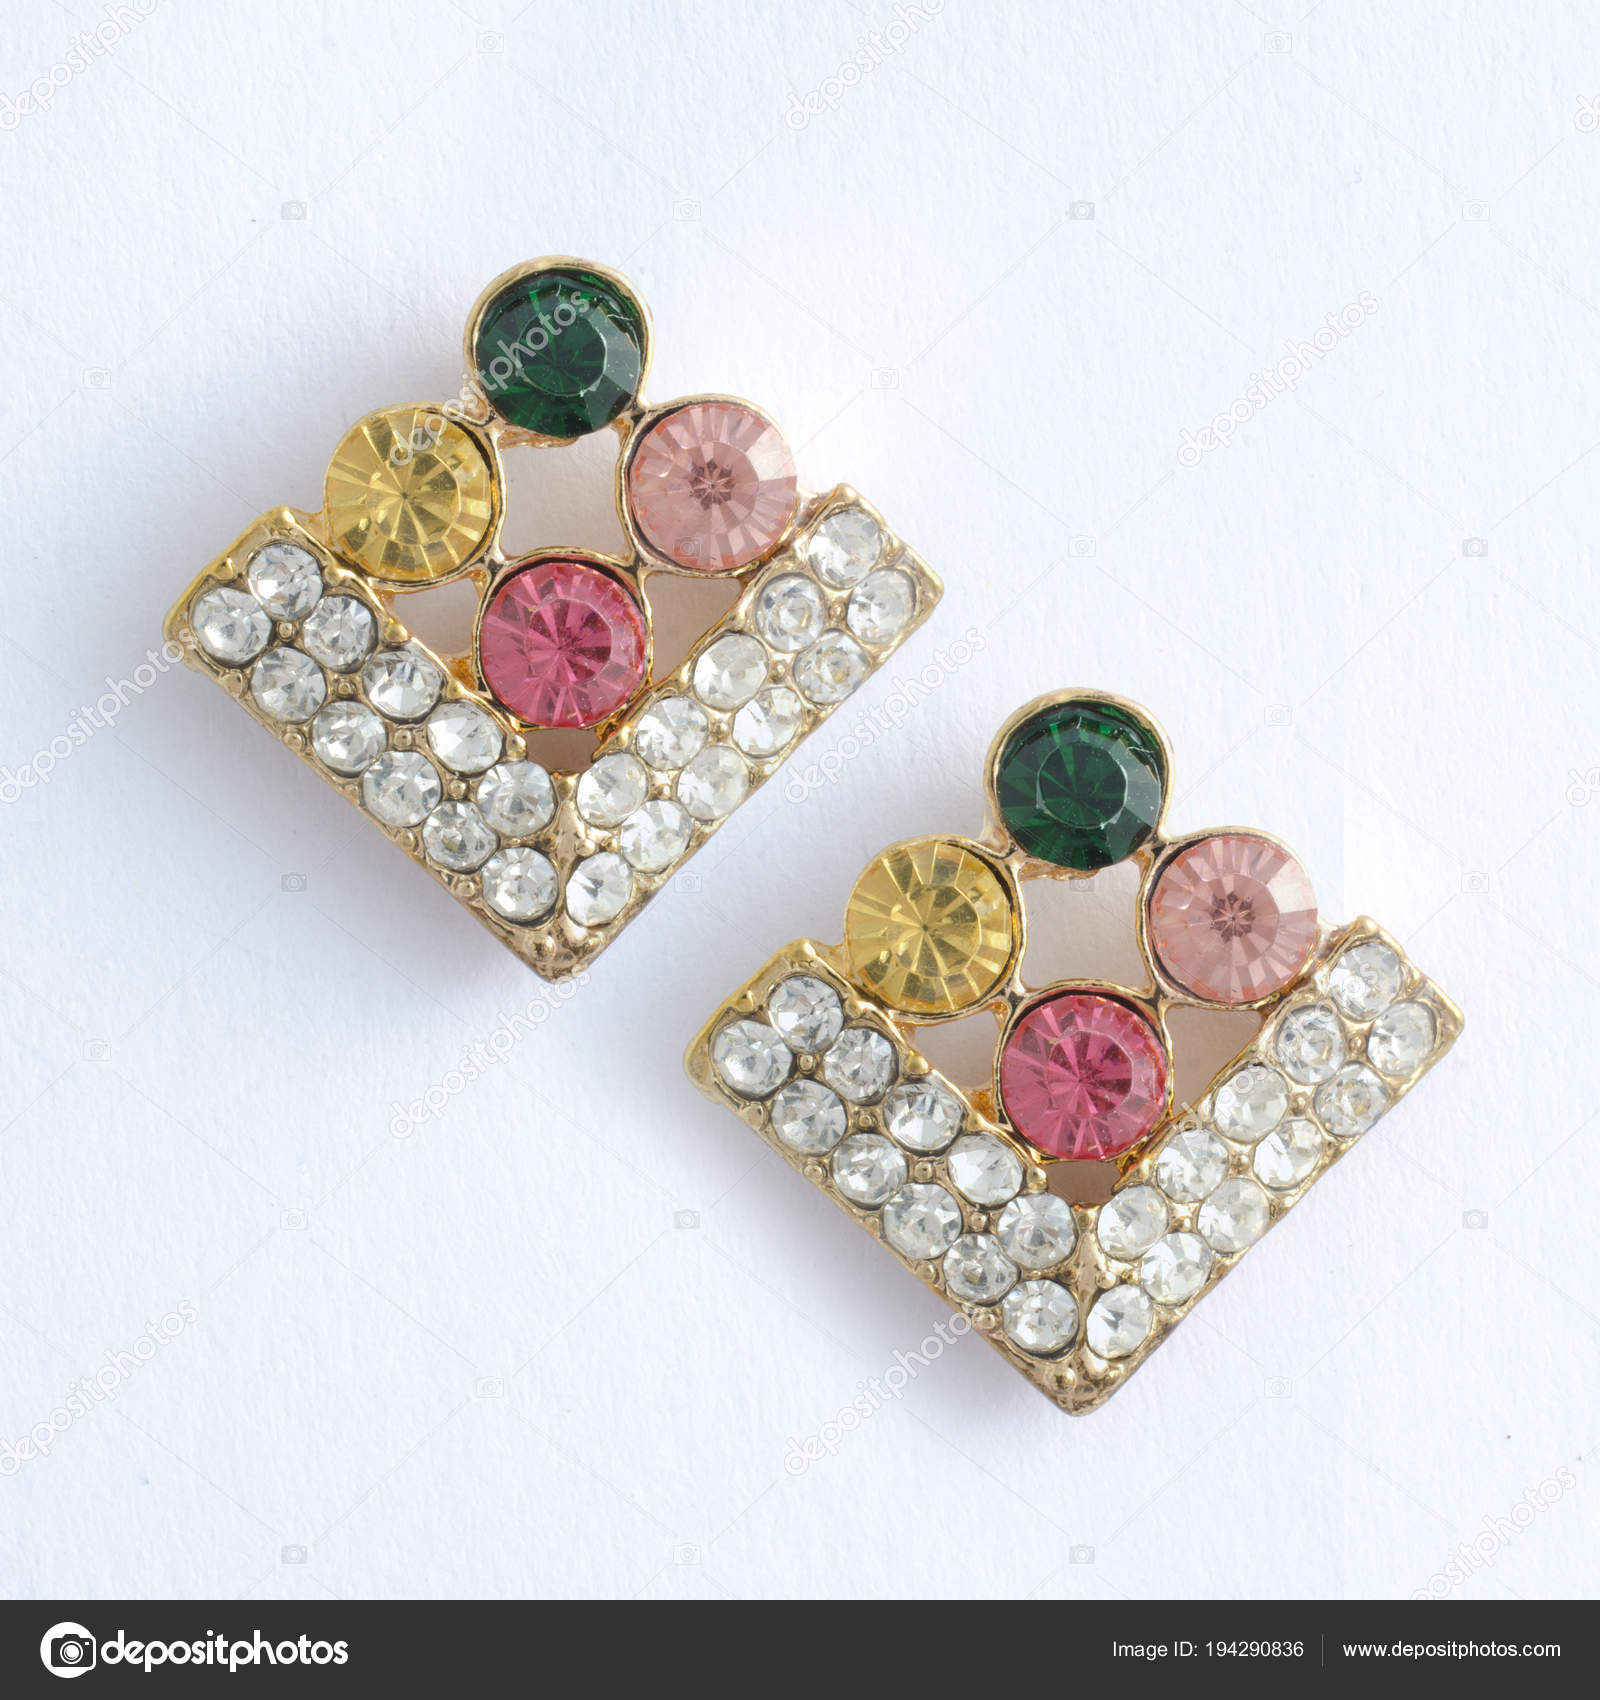 565fa3b47e03 pendientes de rombos de oro con piedras preciosas